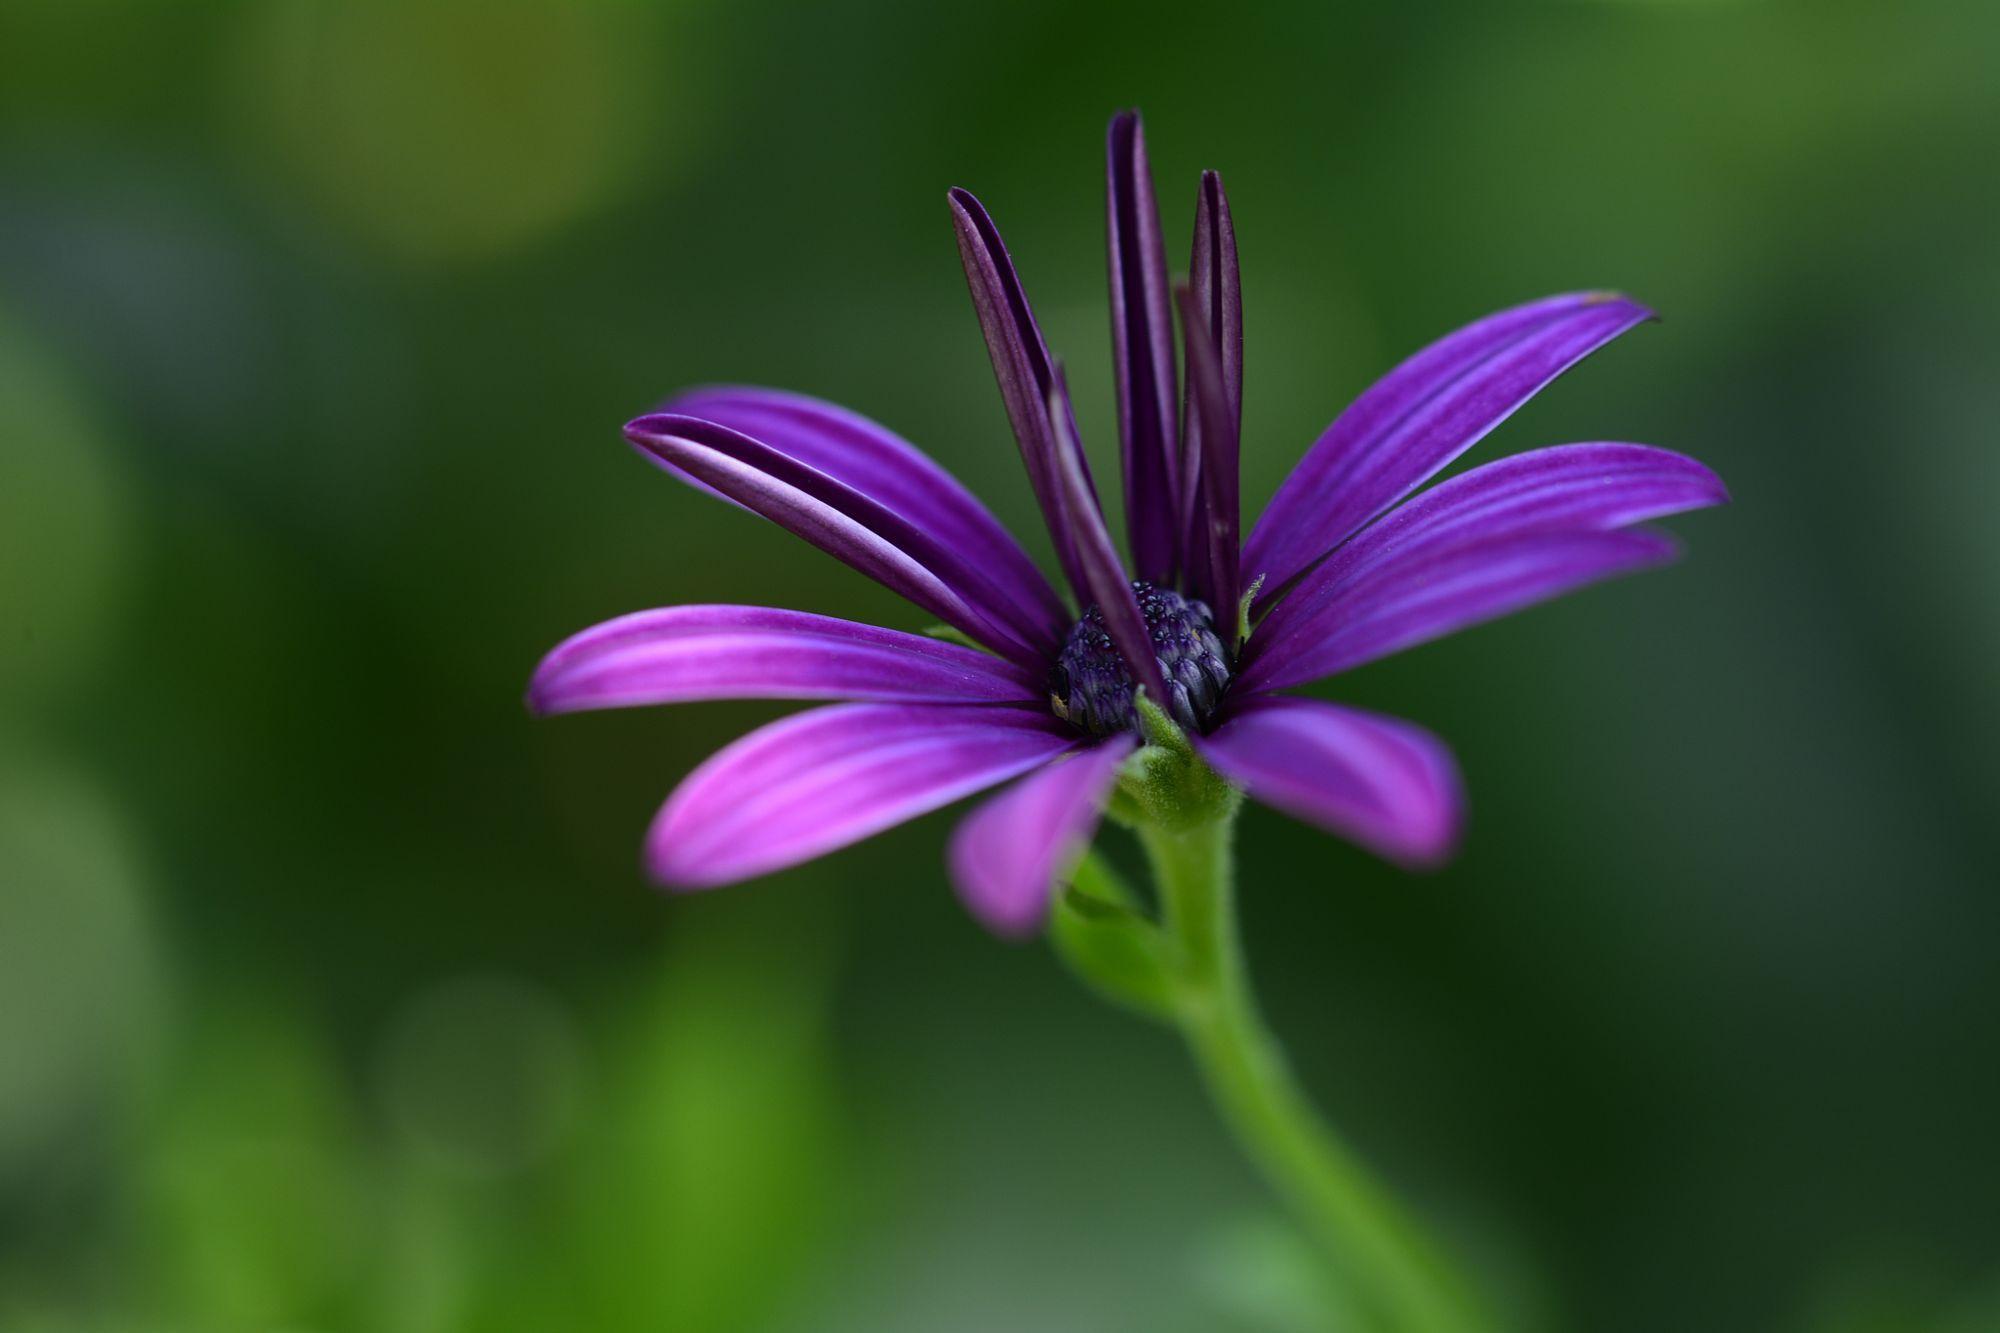 purple flower  Macro photo by Sultann http://rarme.com/?F9gZi